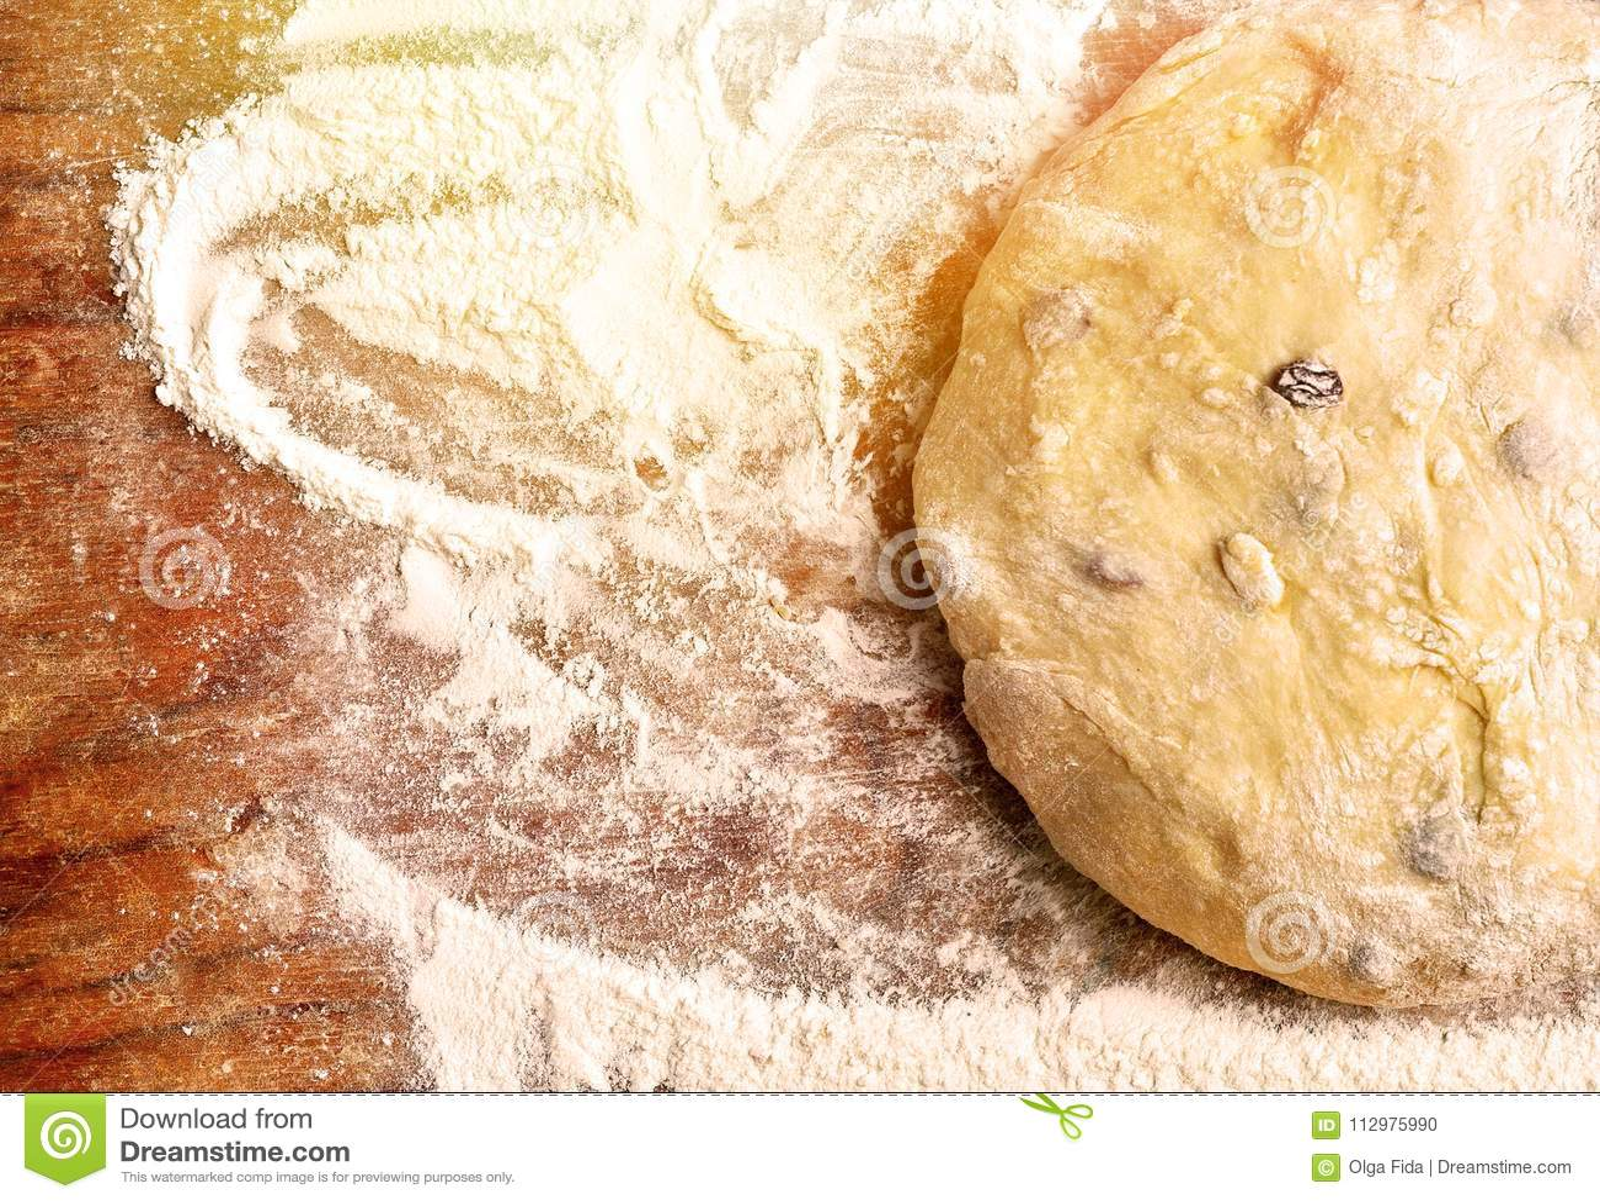 Yeast dough with raisins in flour